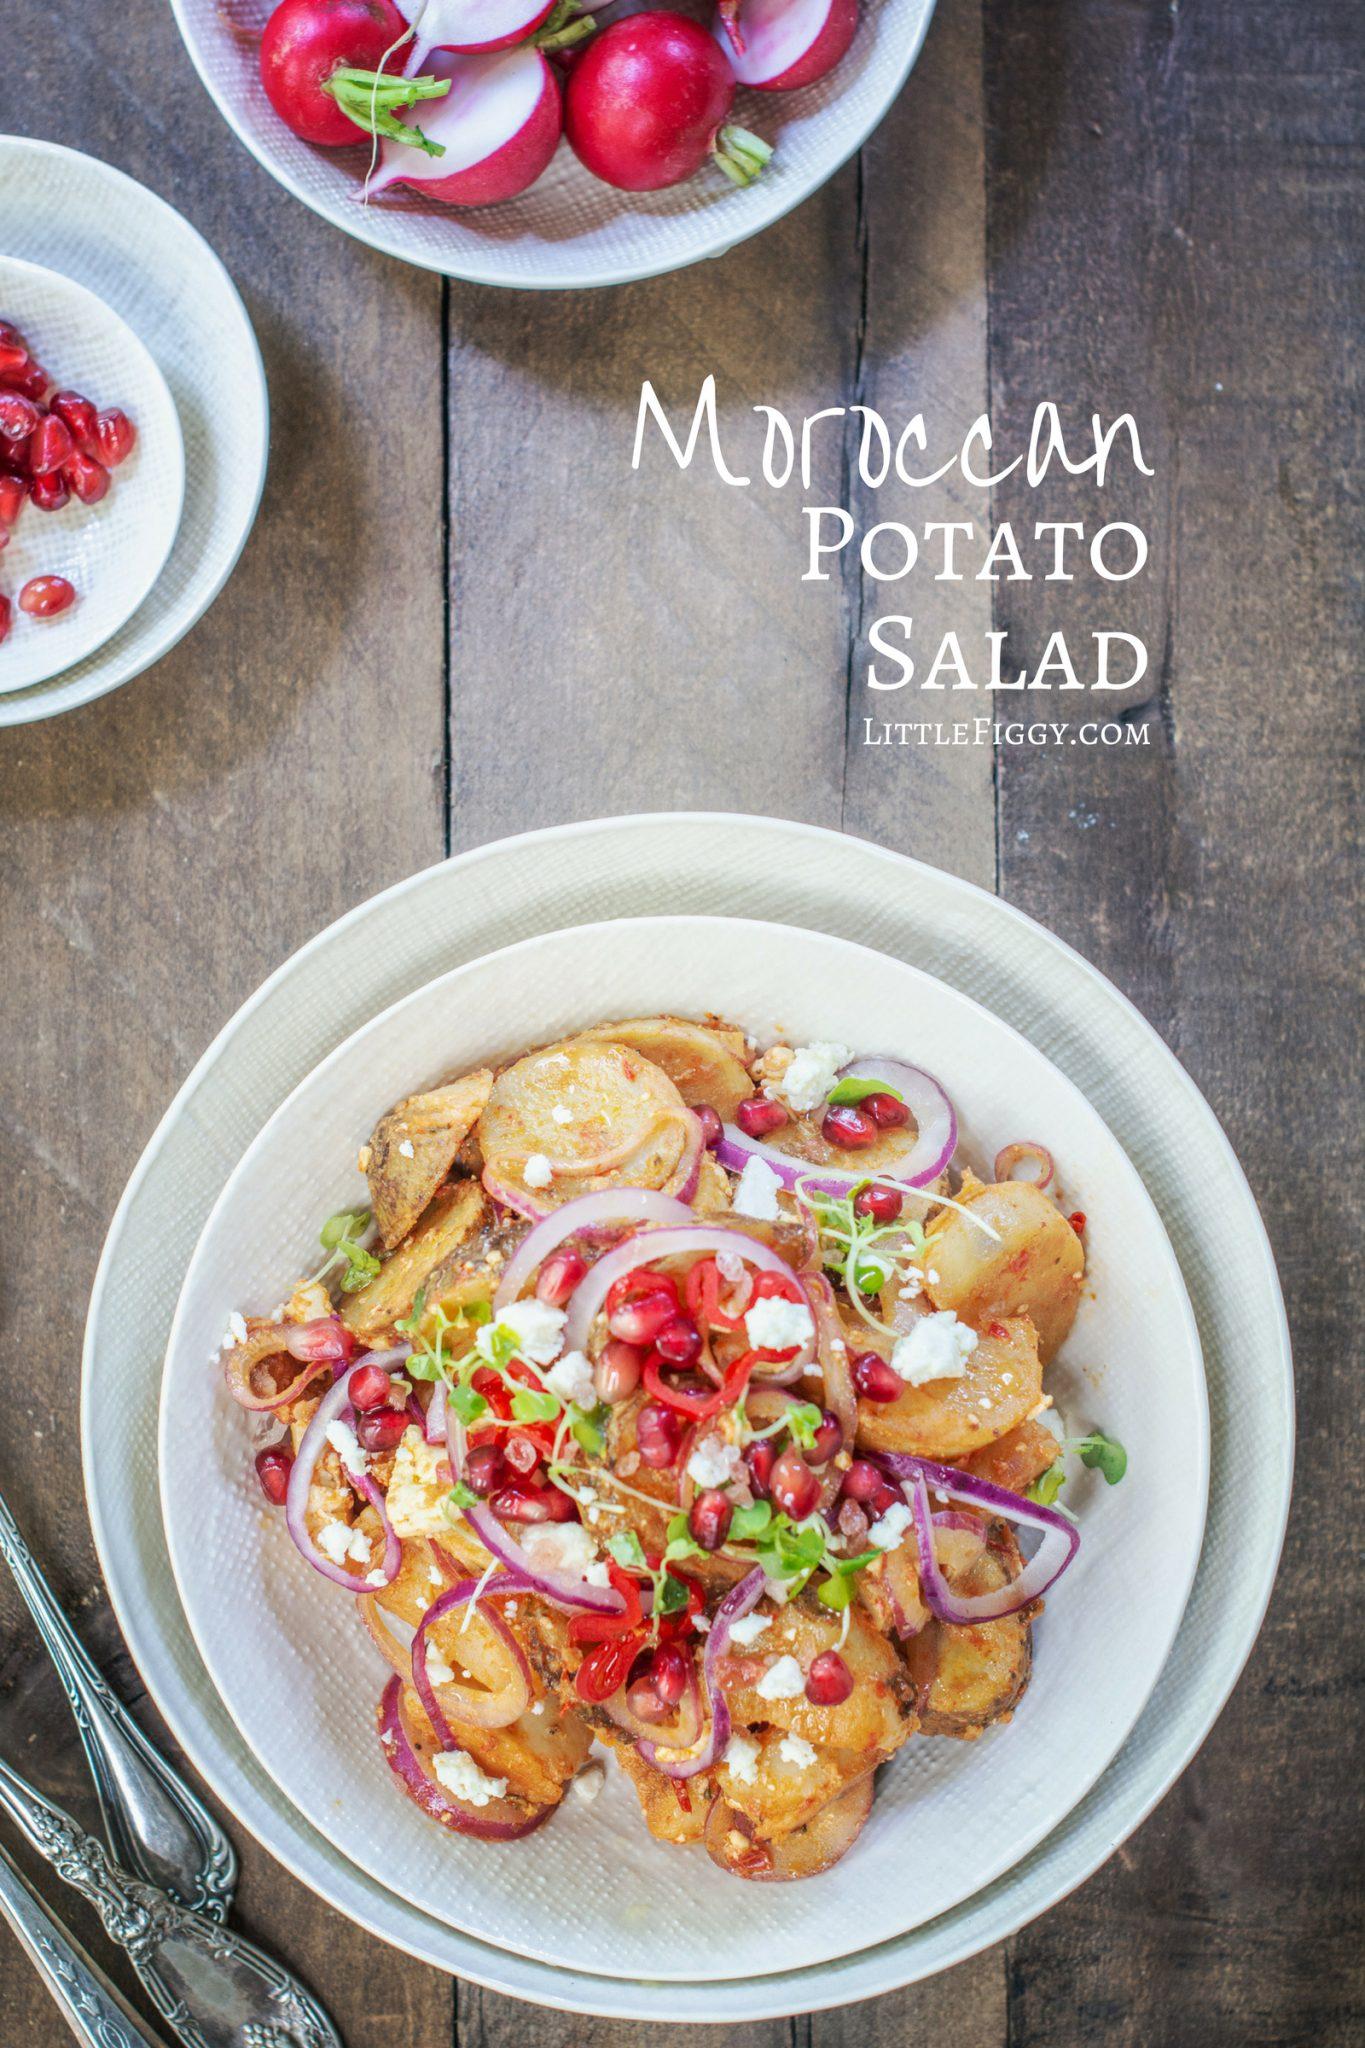 A colorful and full of flavor Moroccan Potato Salad recipe.